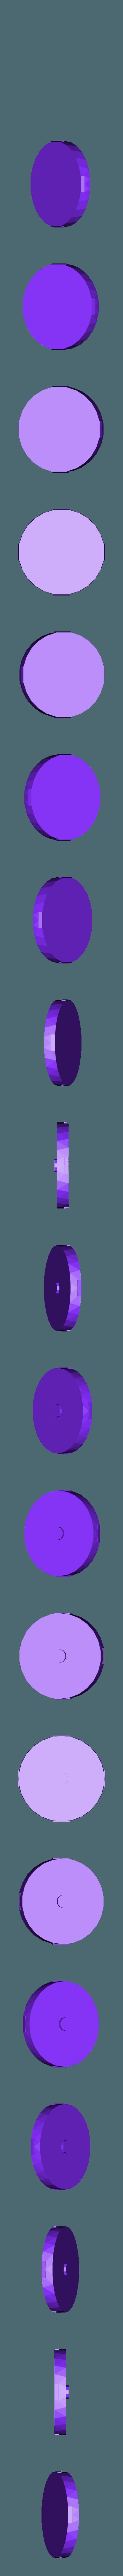 Moyen BBS Renault partie basse.stl Download STL file Renault BBS hub • Design to 3D print, fanfy54